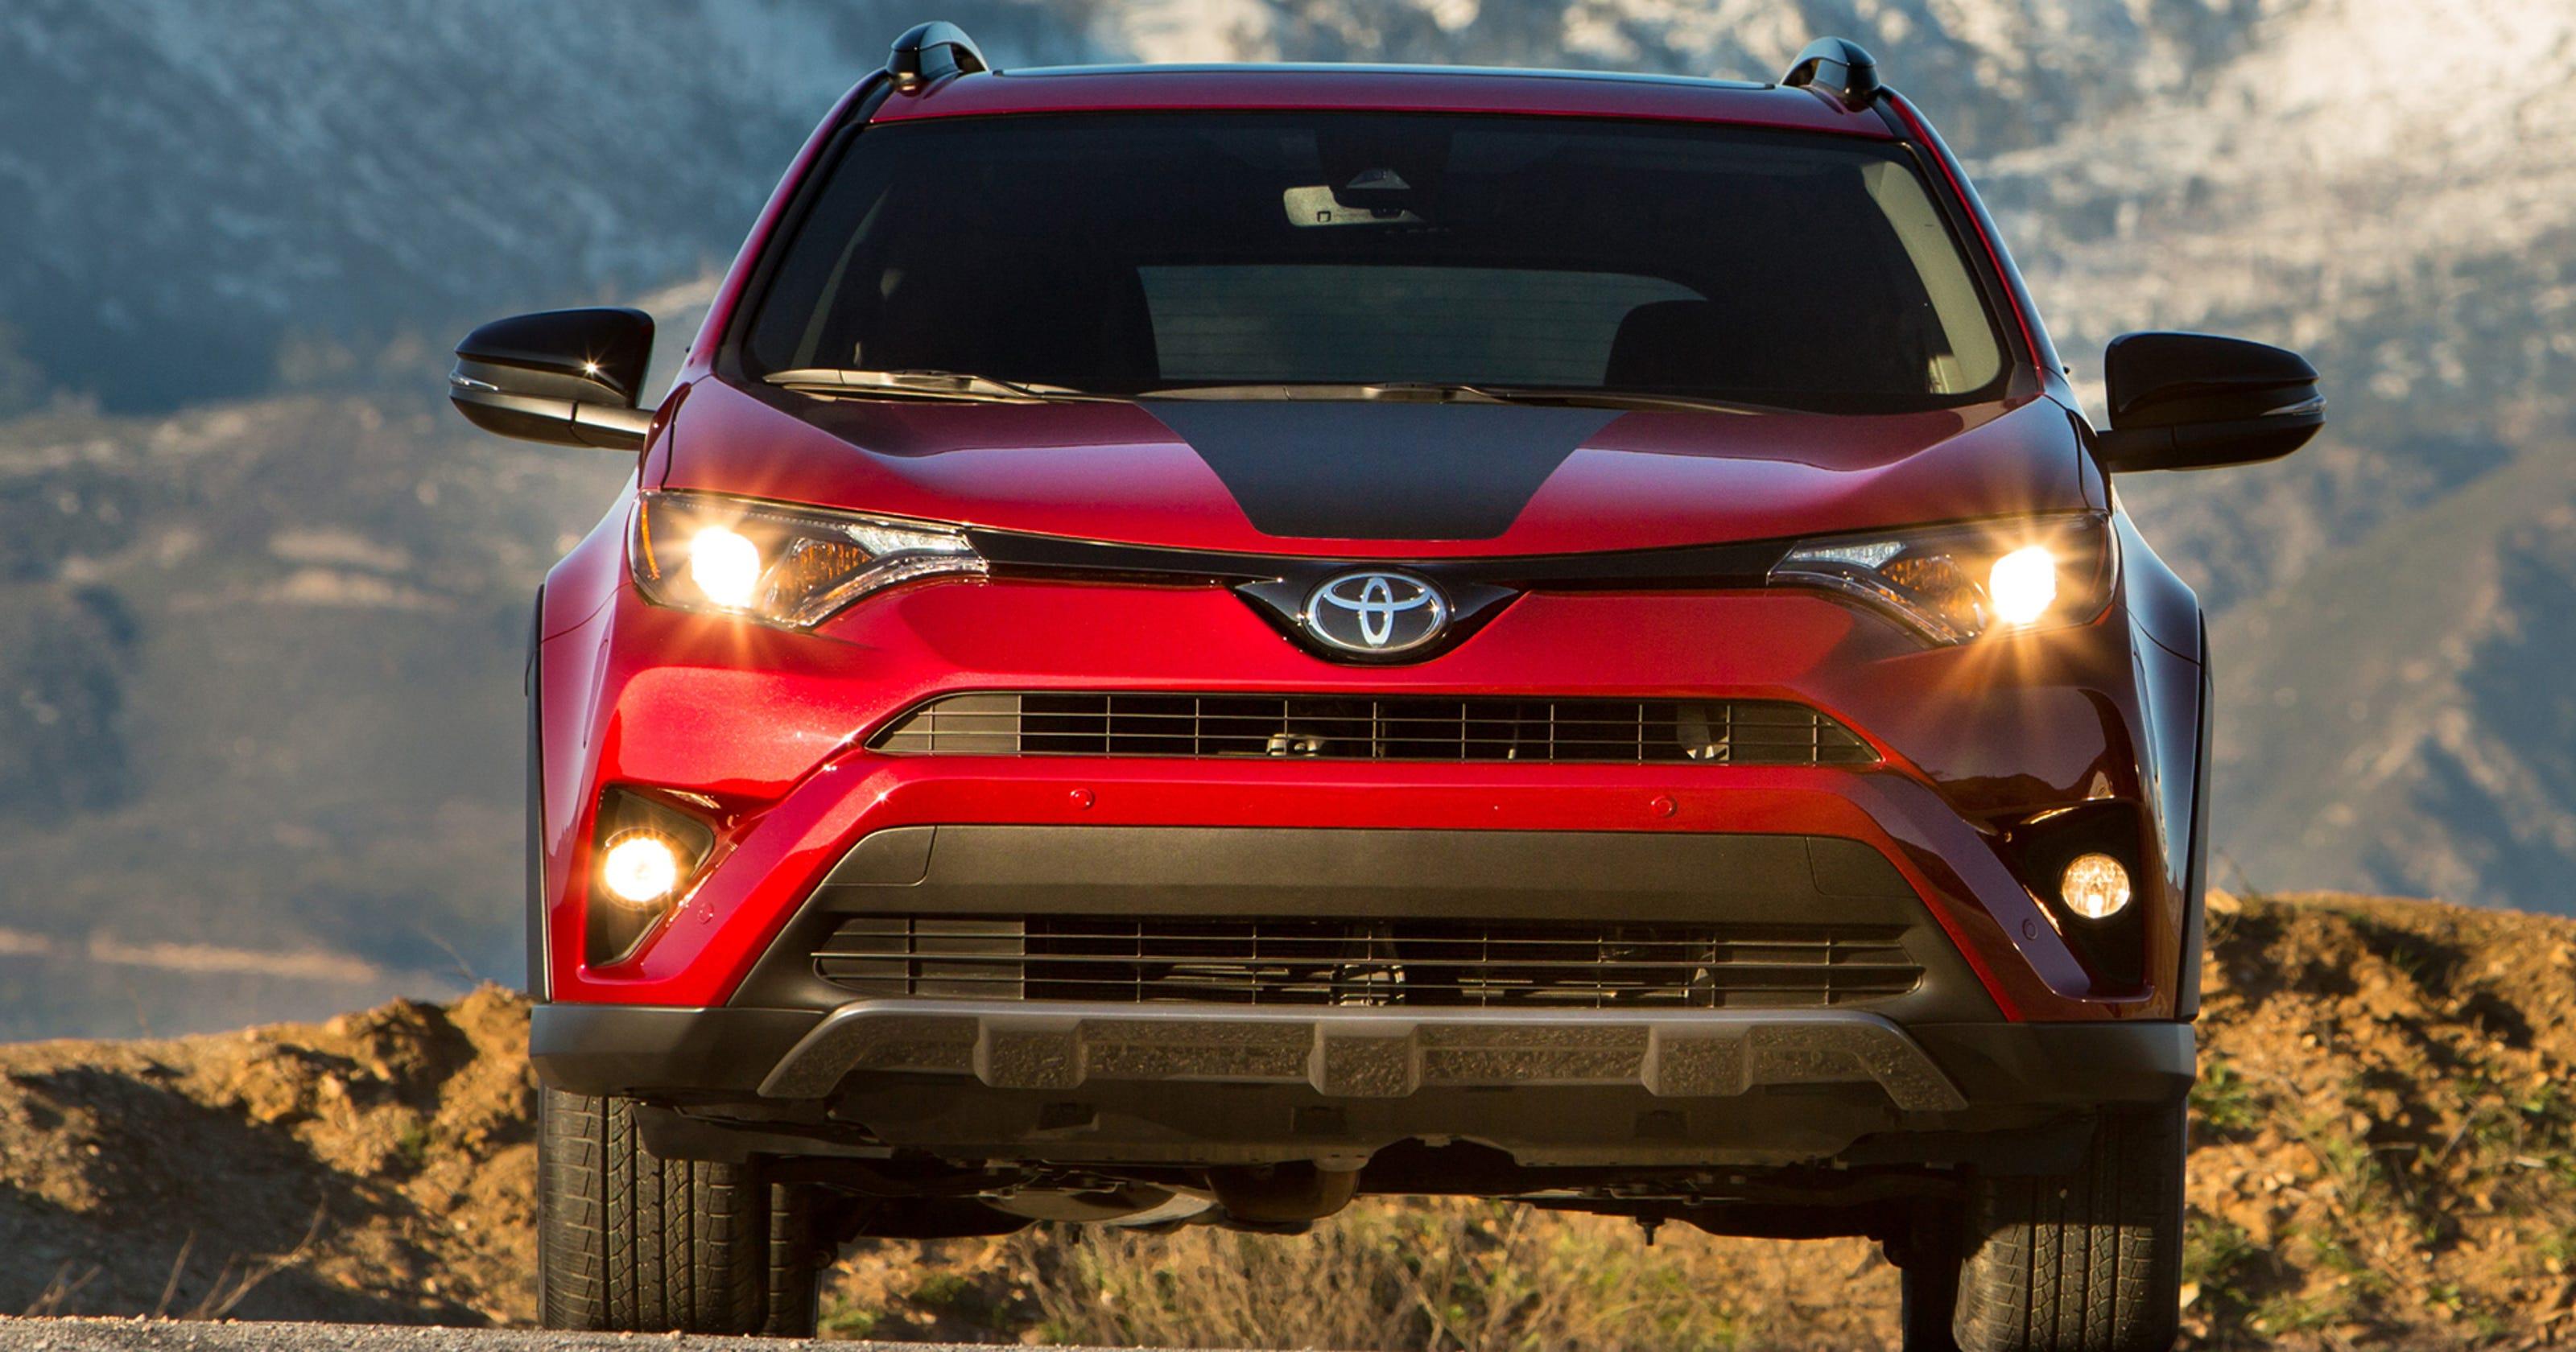 Toyota RAV4 gets sportier with Adventure version